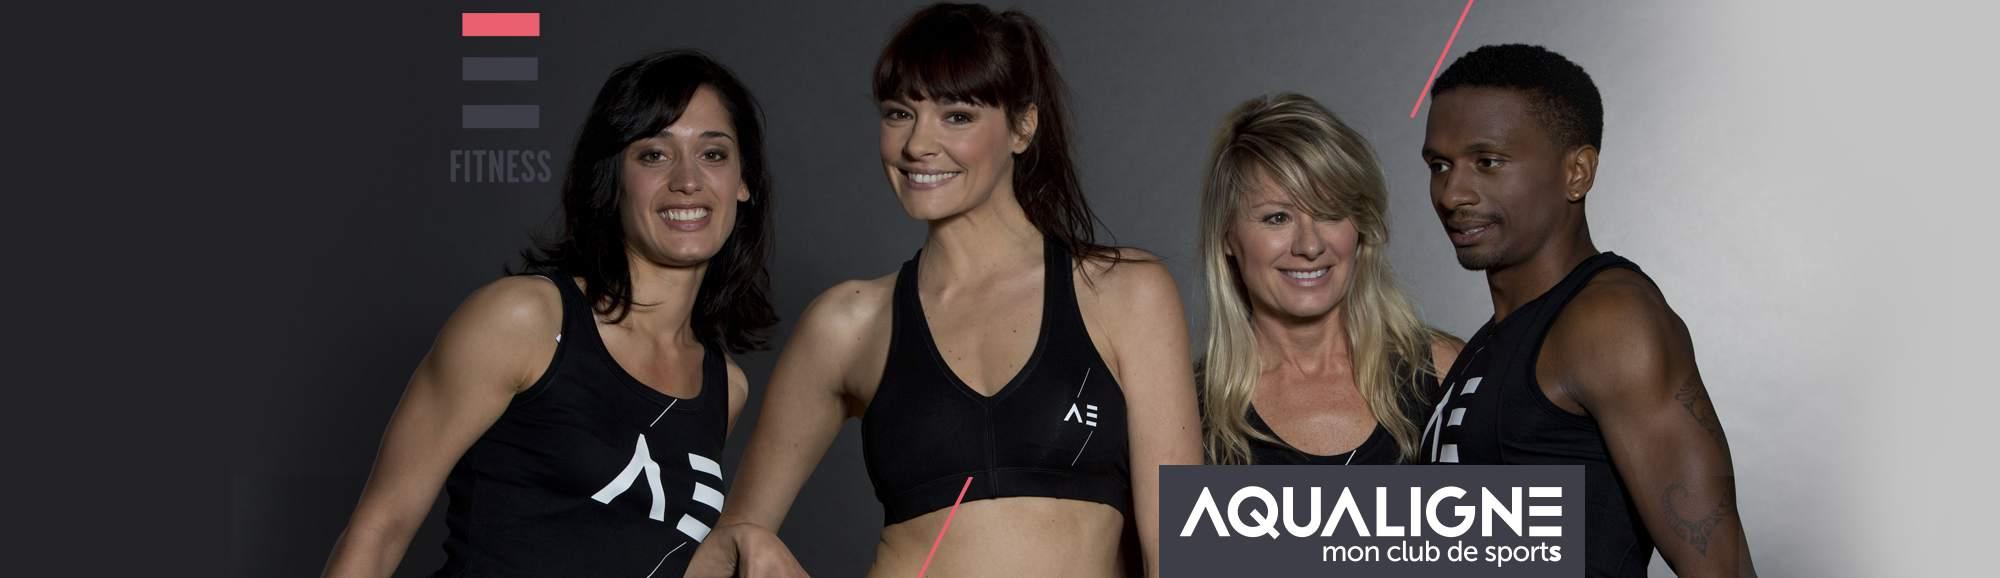 AQUALIGNE-club-fitness-bordeaux-merignac-saint-medard